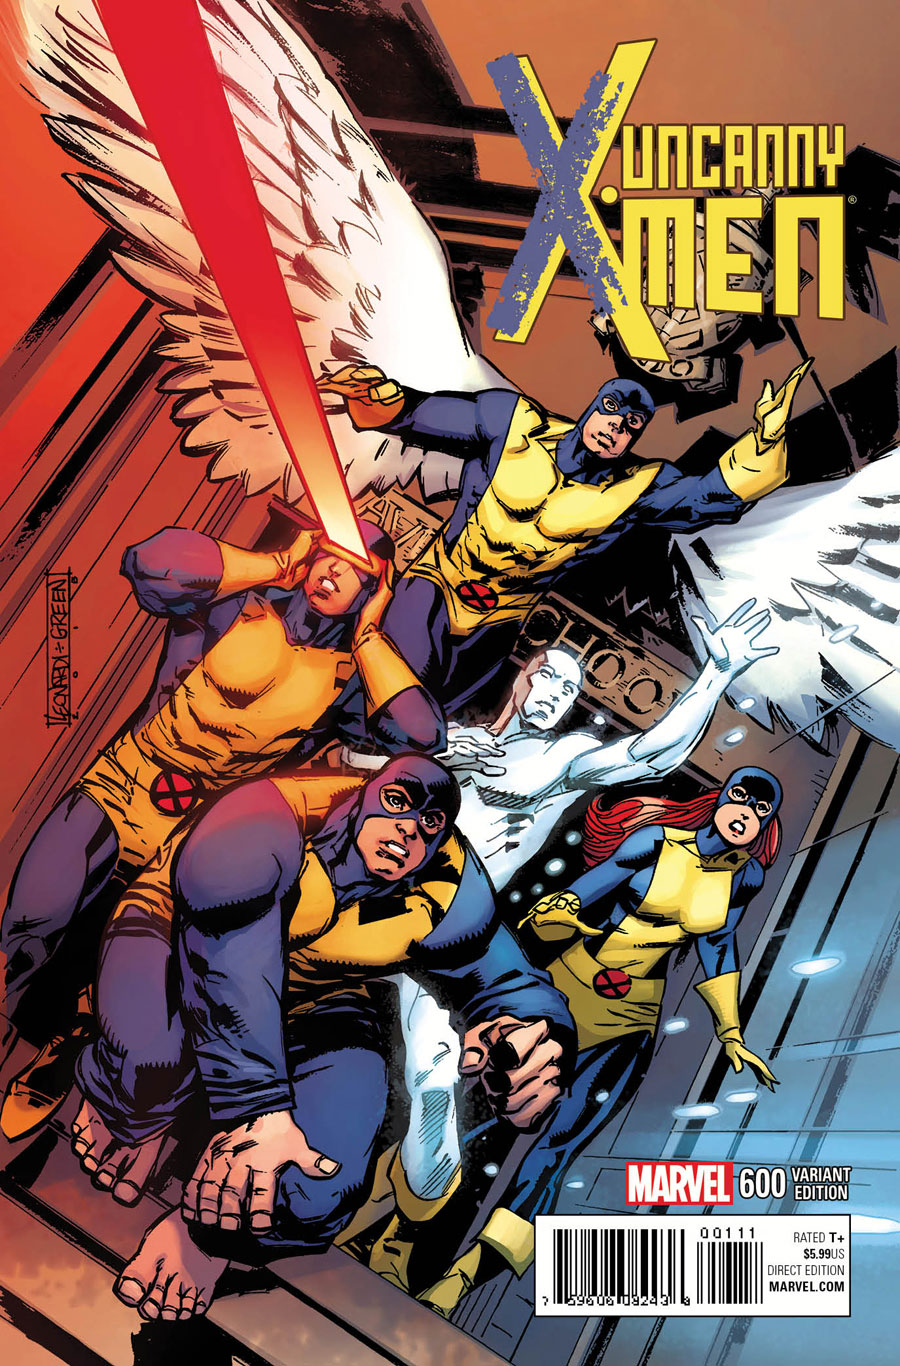 Uncanny X-Men 600 Rick Leonardi variant